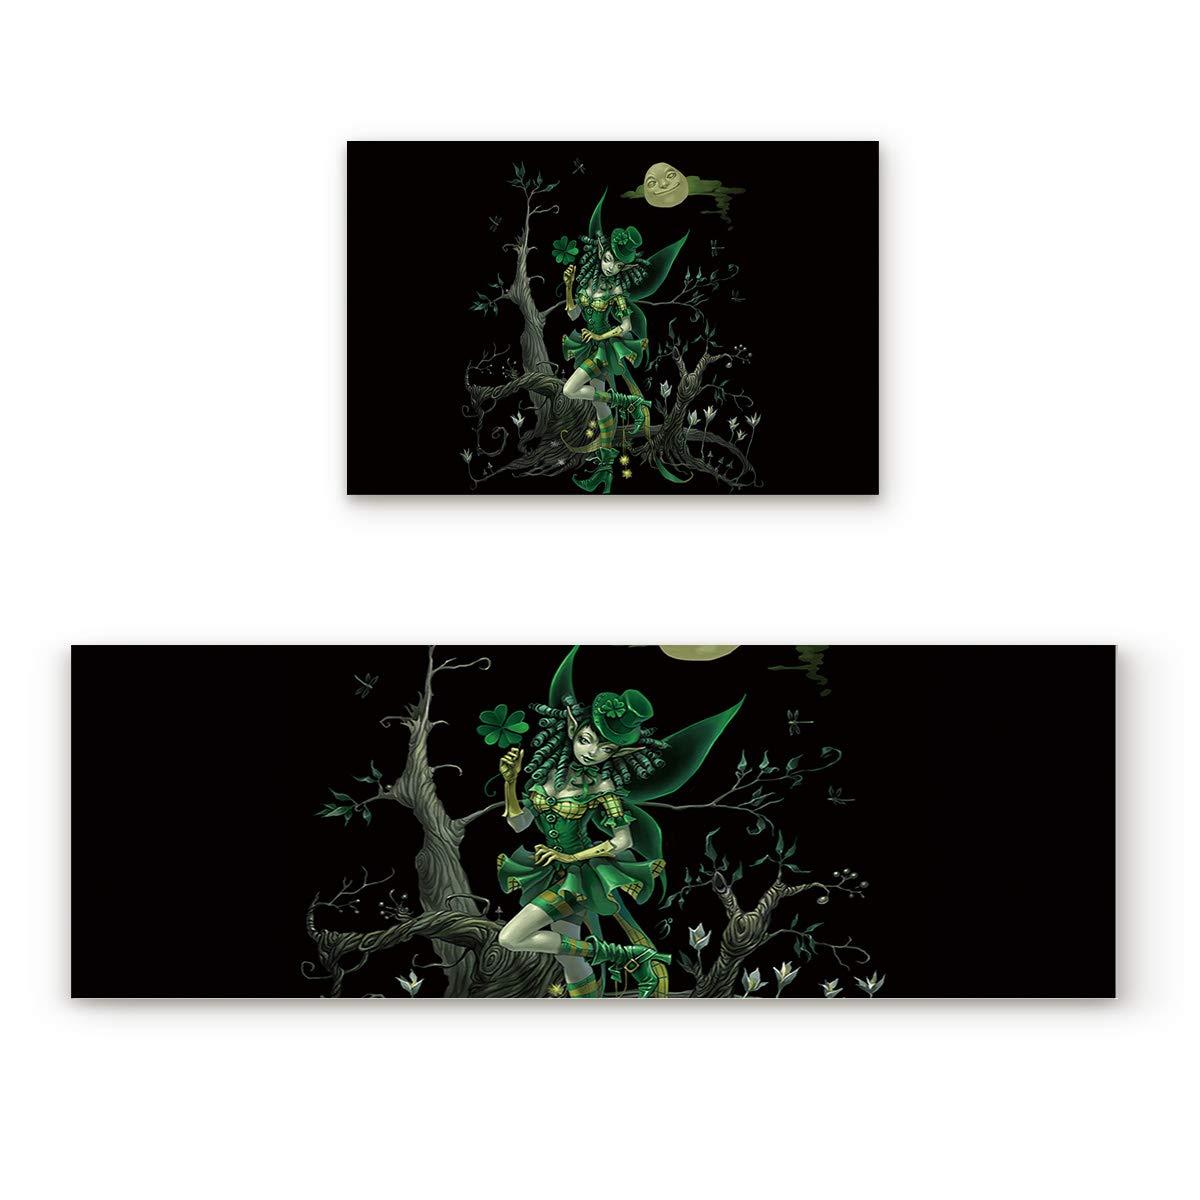 St. Patrick's Day3229LFIY3298 23.6x35.4In+23.6x70.9In Findamy Non-Slip Indoor Door Mat Entrance Rug Rectangle Absorbent Moisture Floor Carpet for St. Patrick's Day Theme Doormat 23.6x35.4In+23.6x70.9In